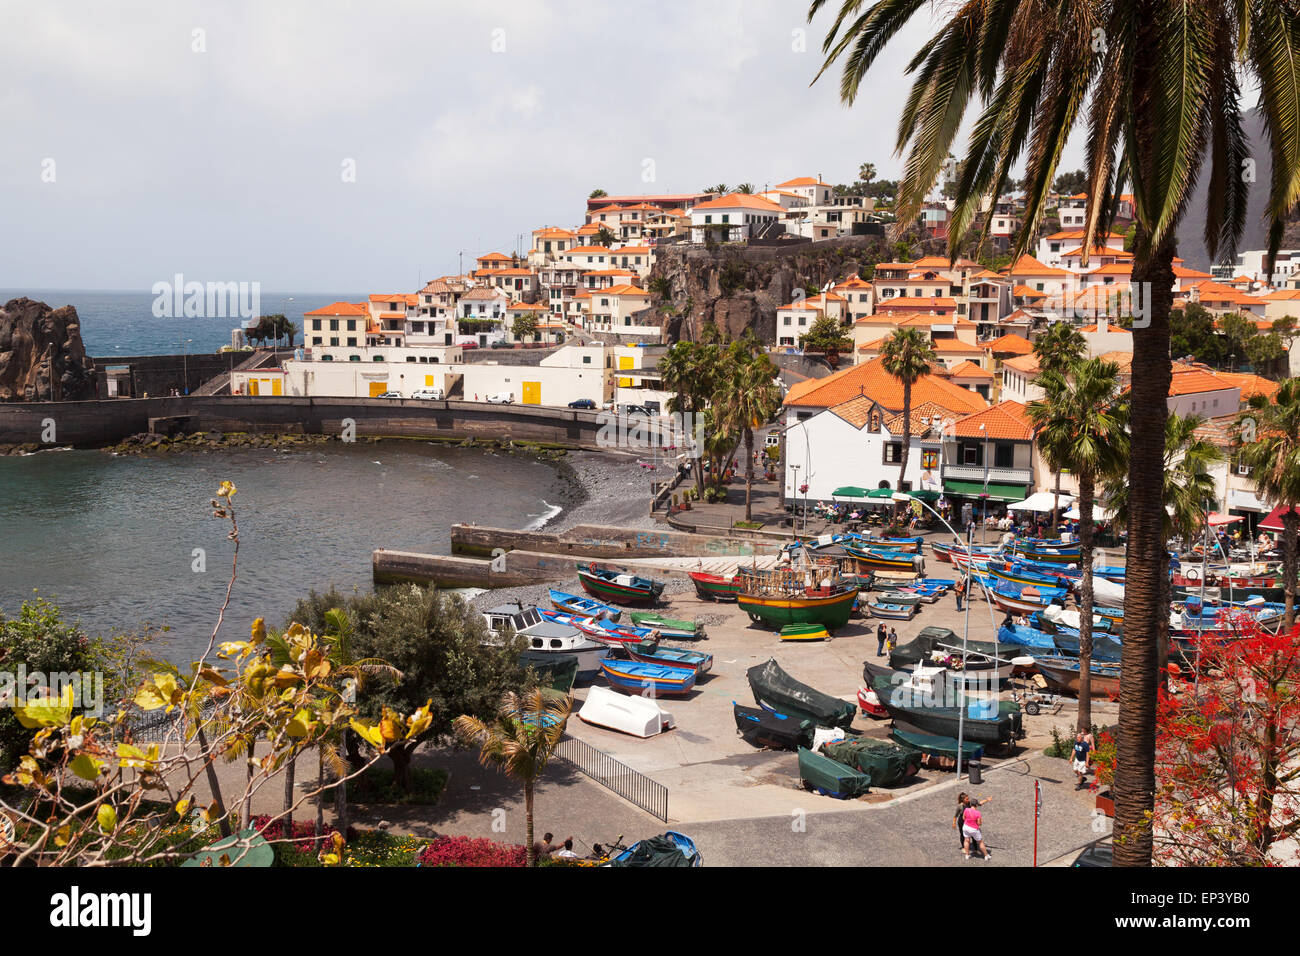 Le village de pêcheurs de Camara de Lobos, Madère, Europe Photo Stock